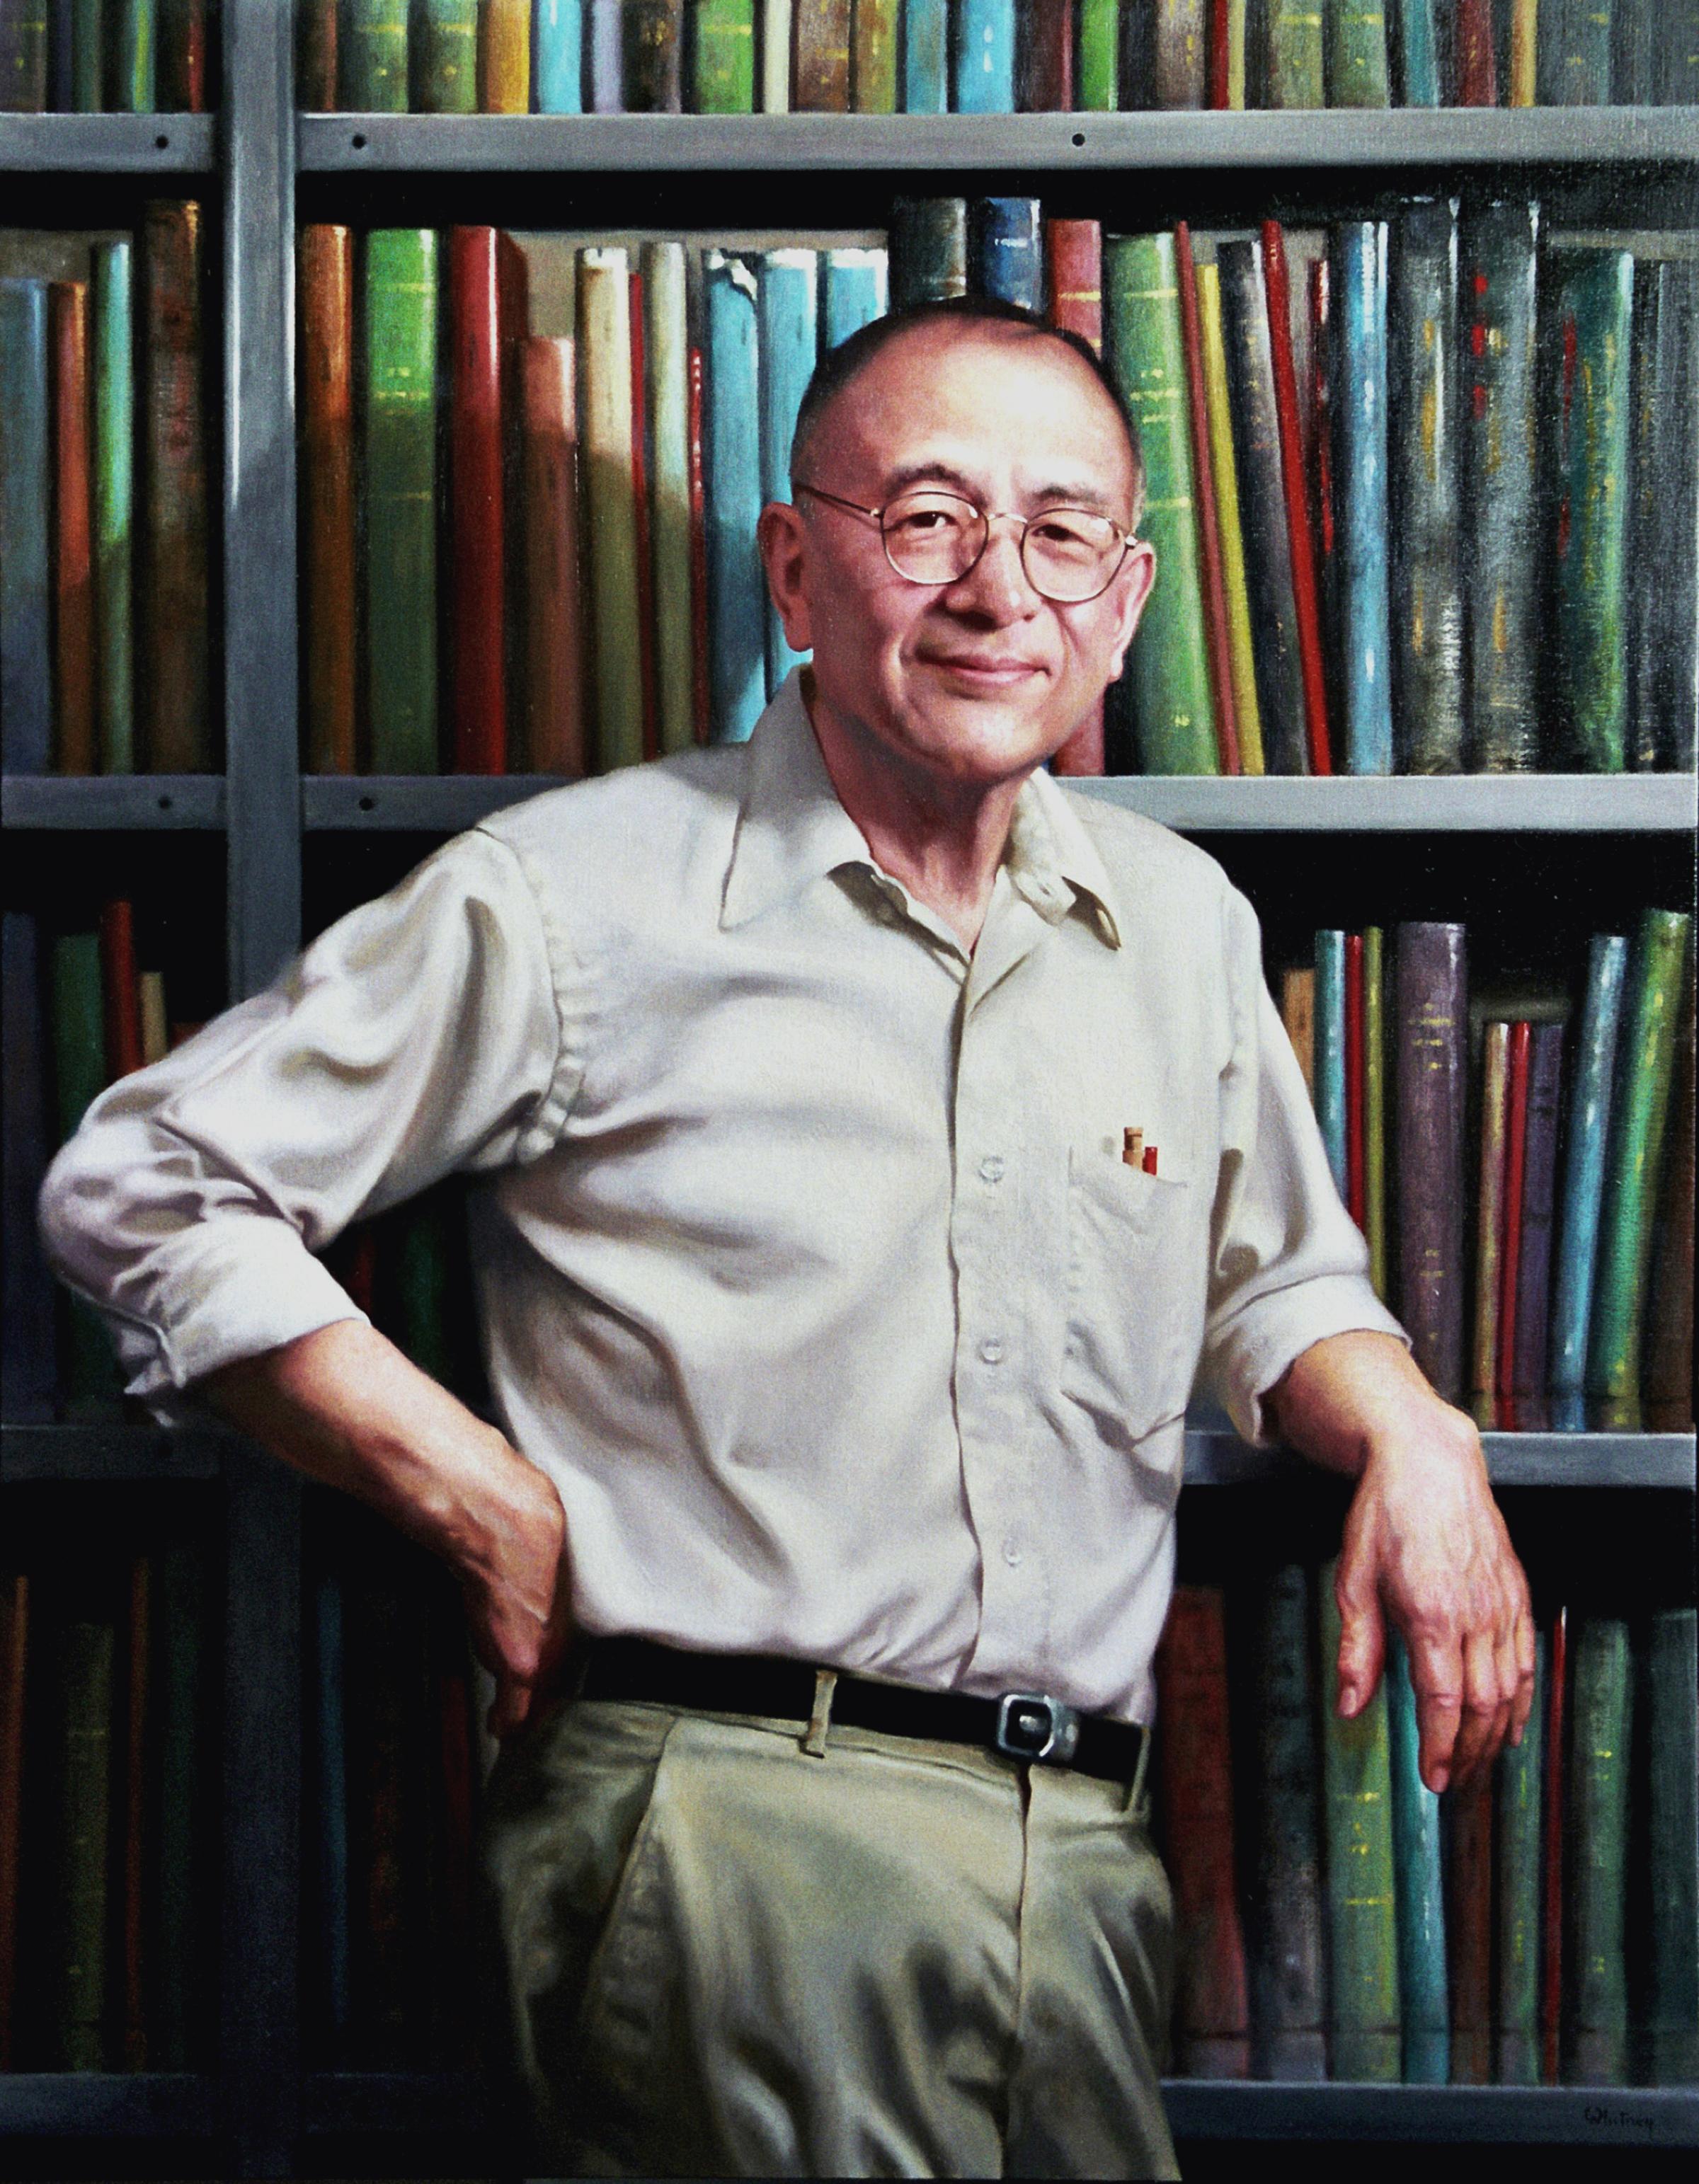 Dr. Nelson Kiang, Mass. Eye & Ear Infirmary